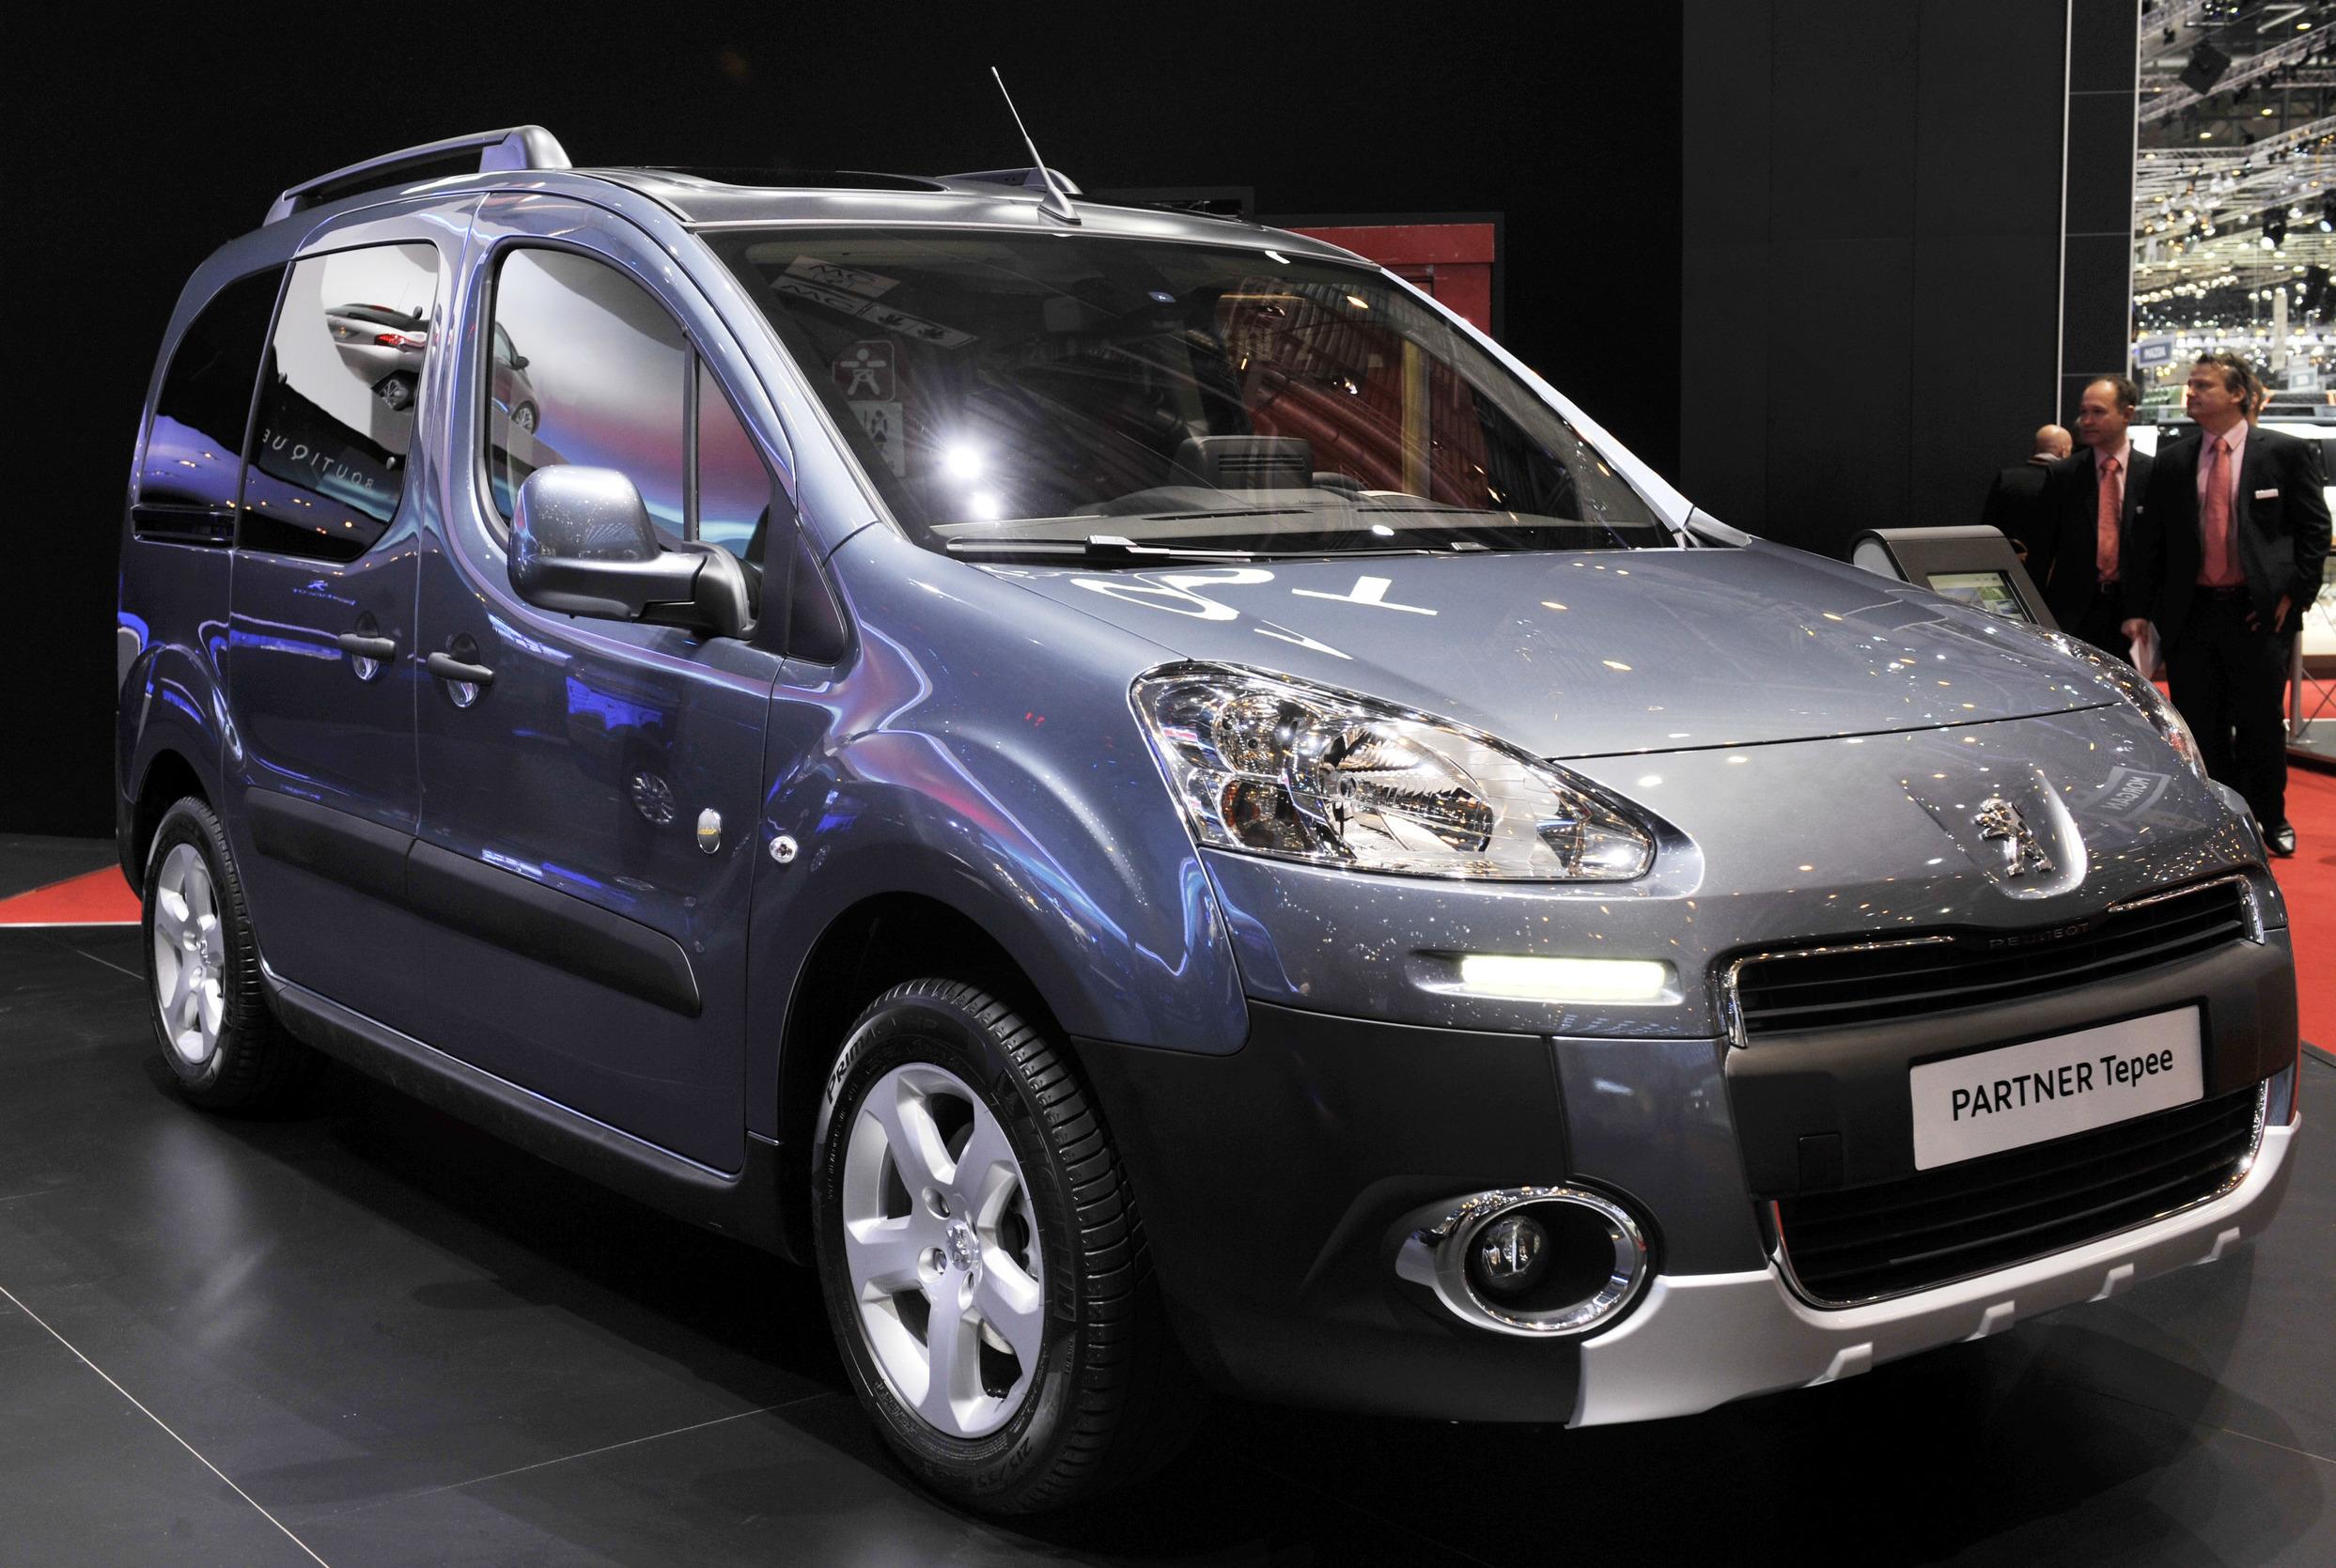 2015 Yeni Peugeot Partner Tepee Incelemesi Uygun Tasit